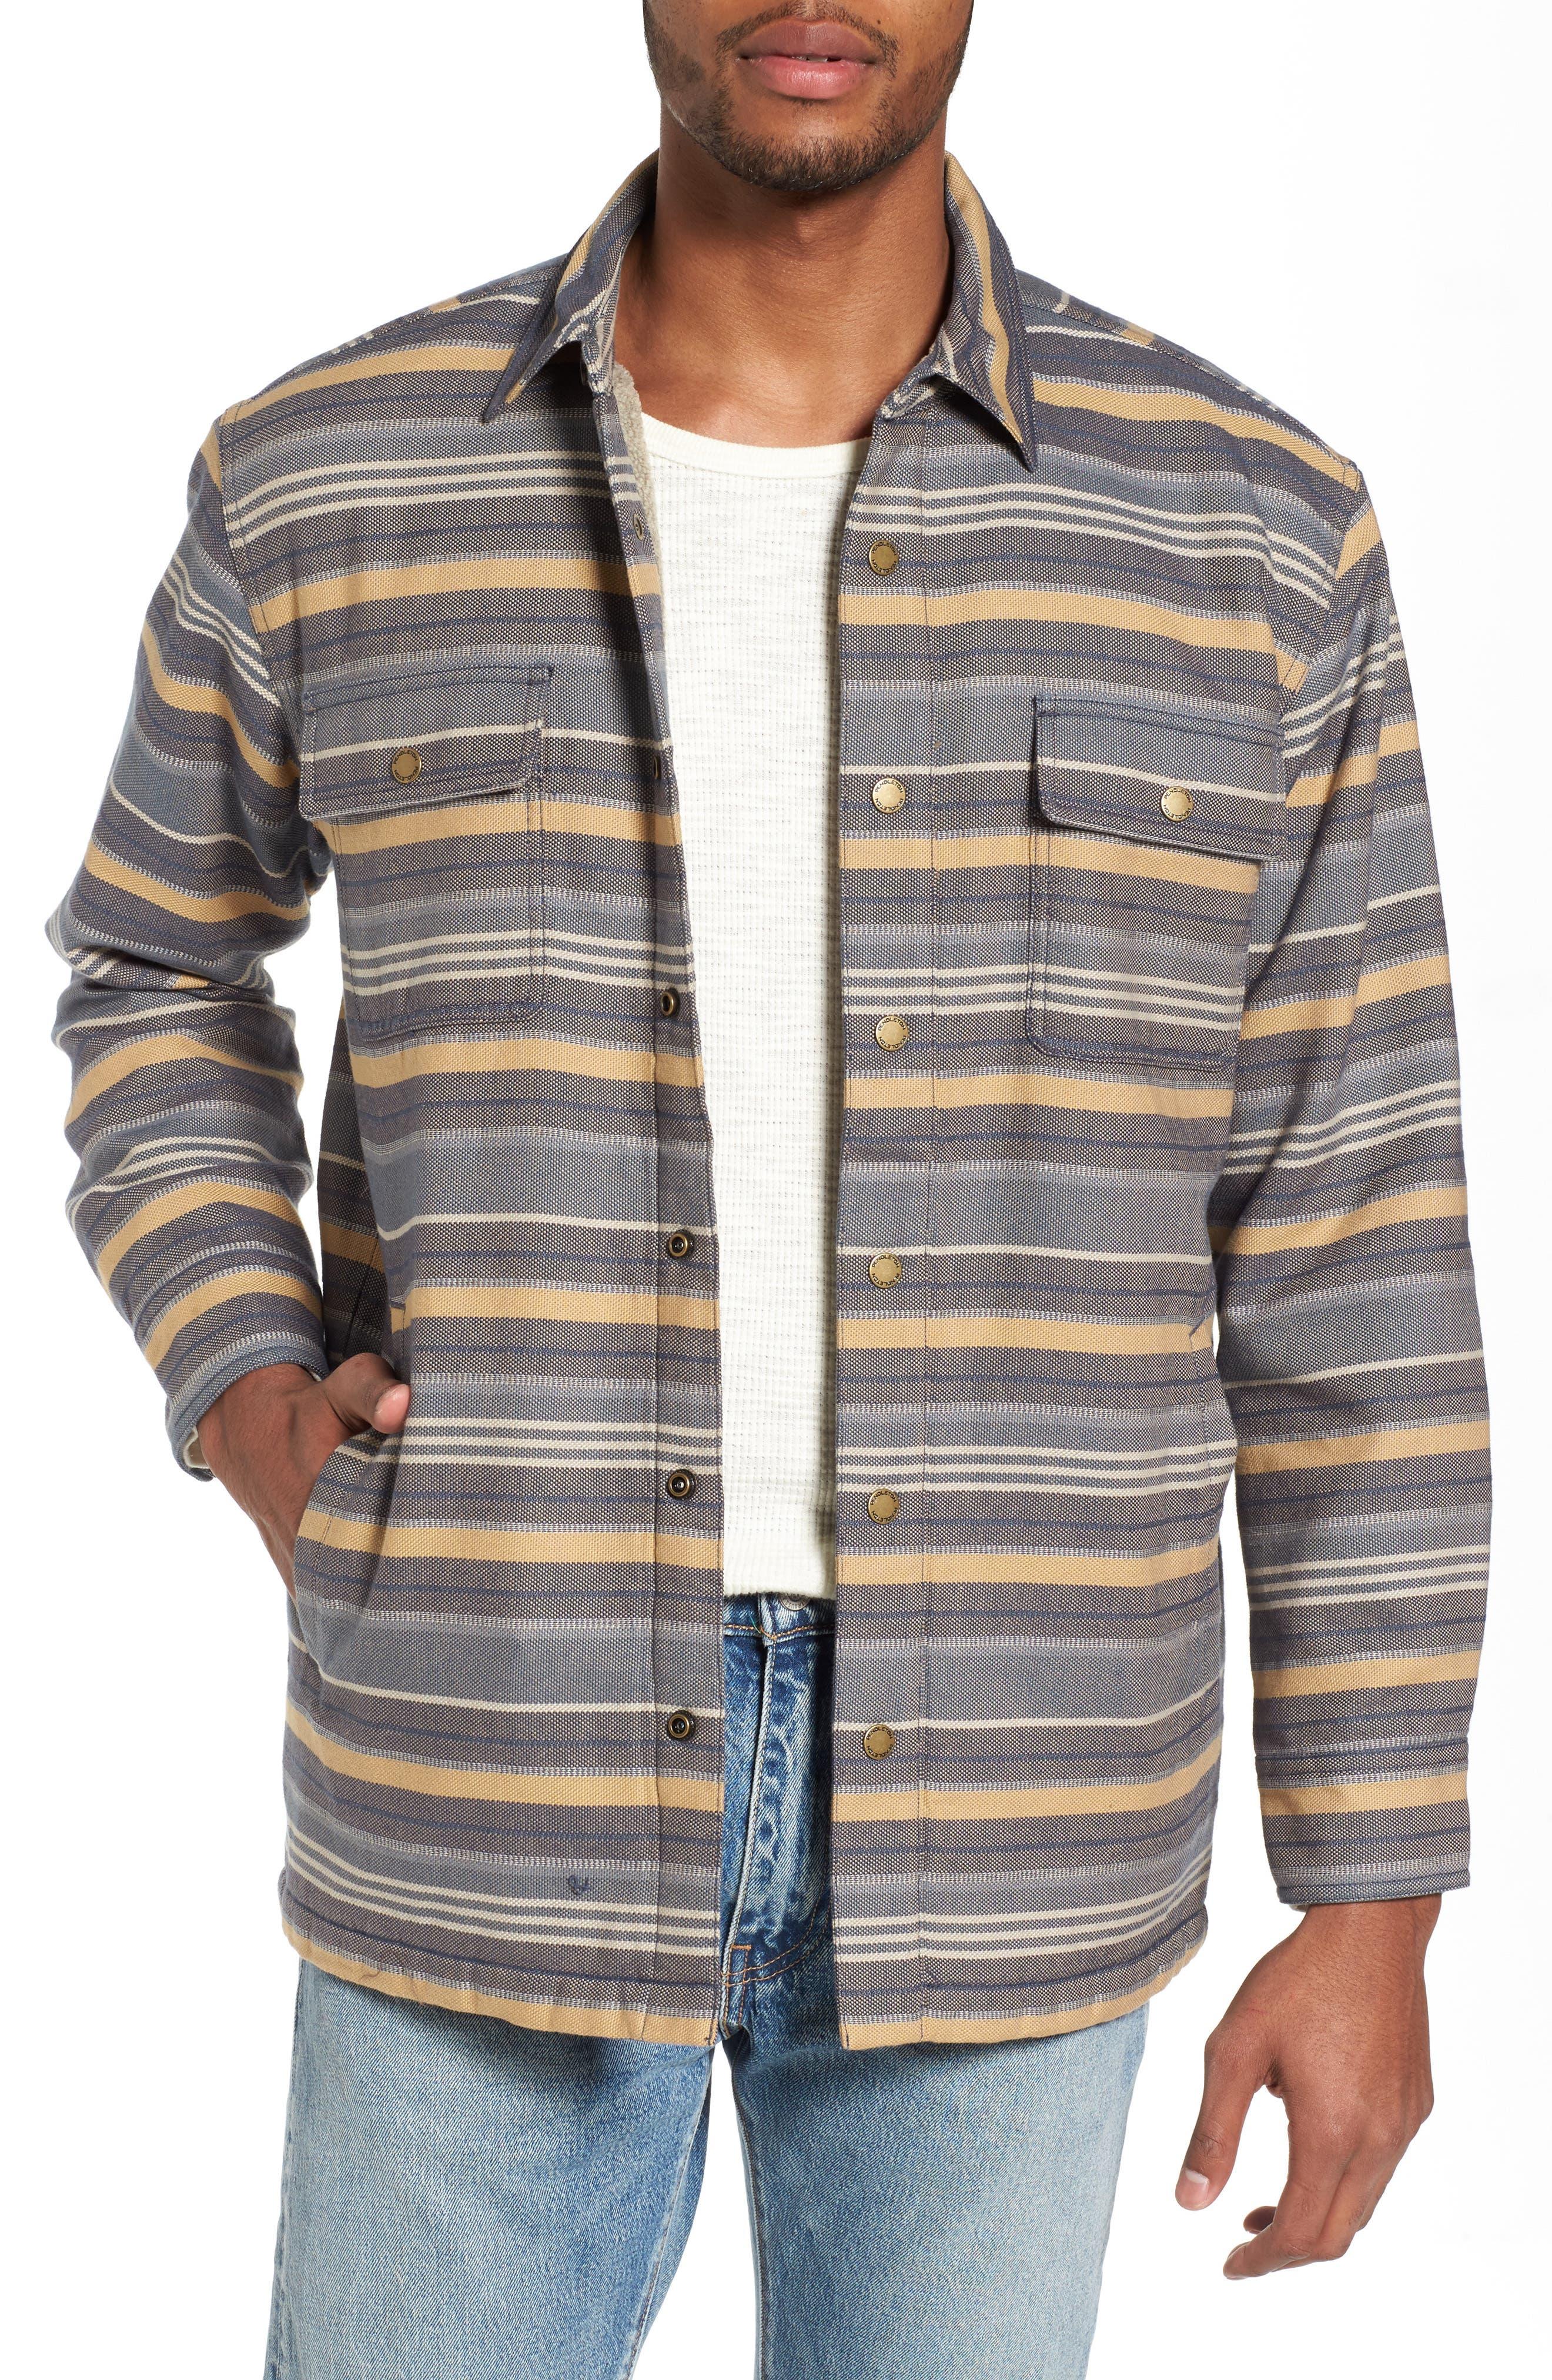 Alternate Image 1 Selected - Pendleton Fleece Lined Shirt Jacket